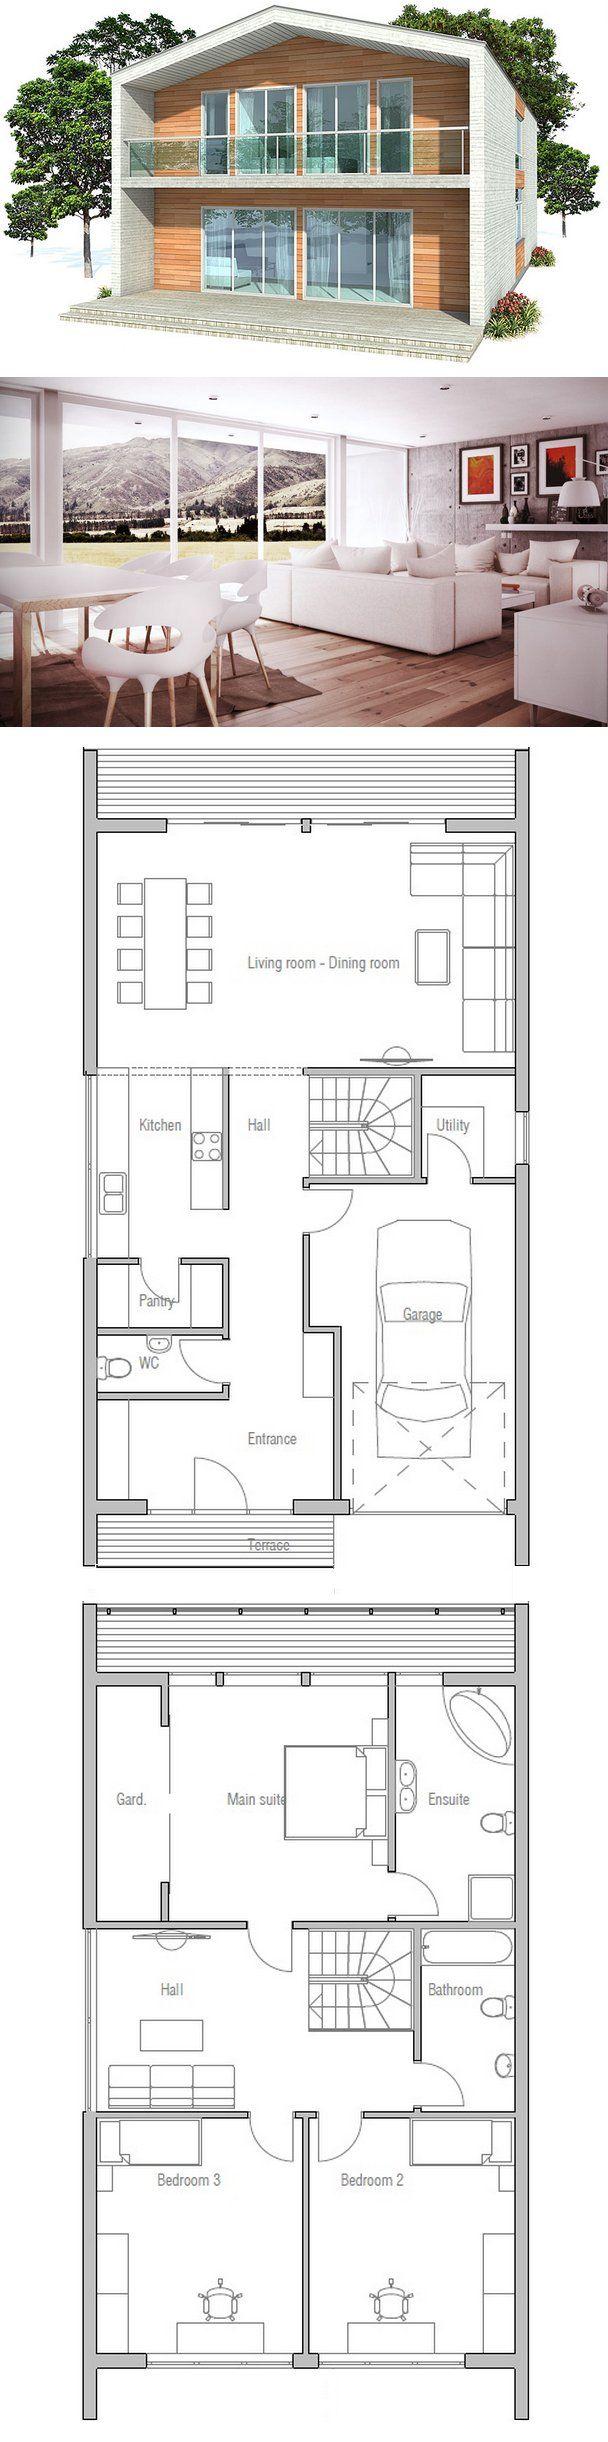 Best 20 sims3 house ideas on pinterest sims house sims for Modern narrow house plans